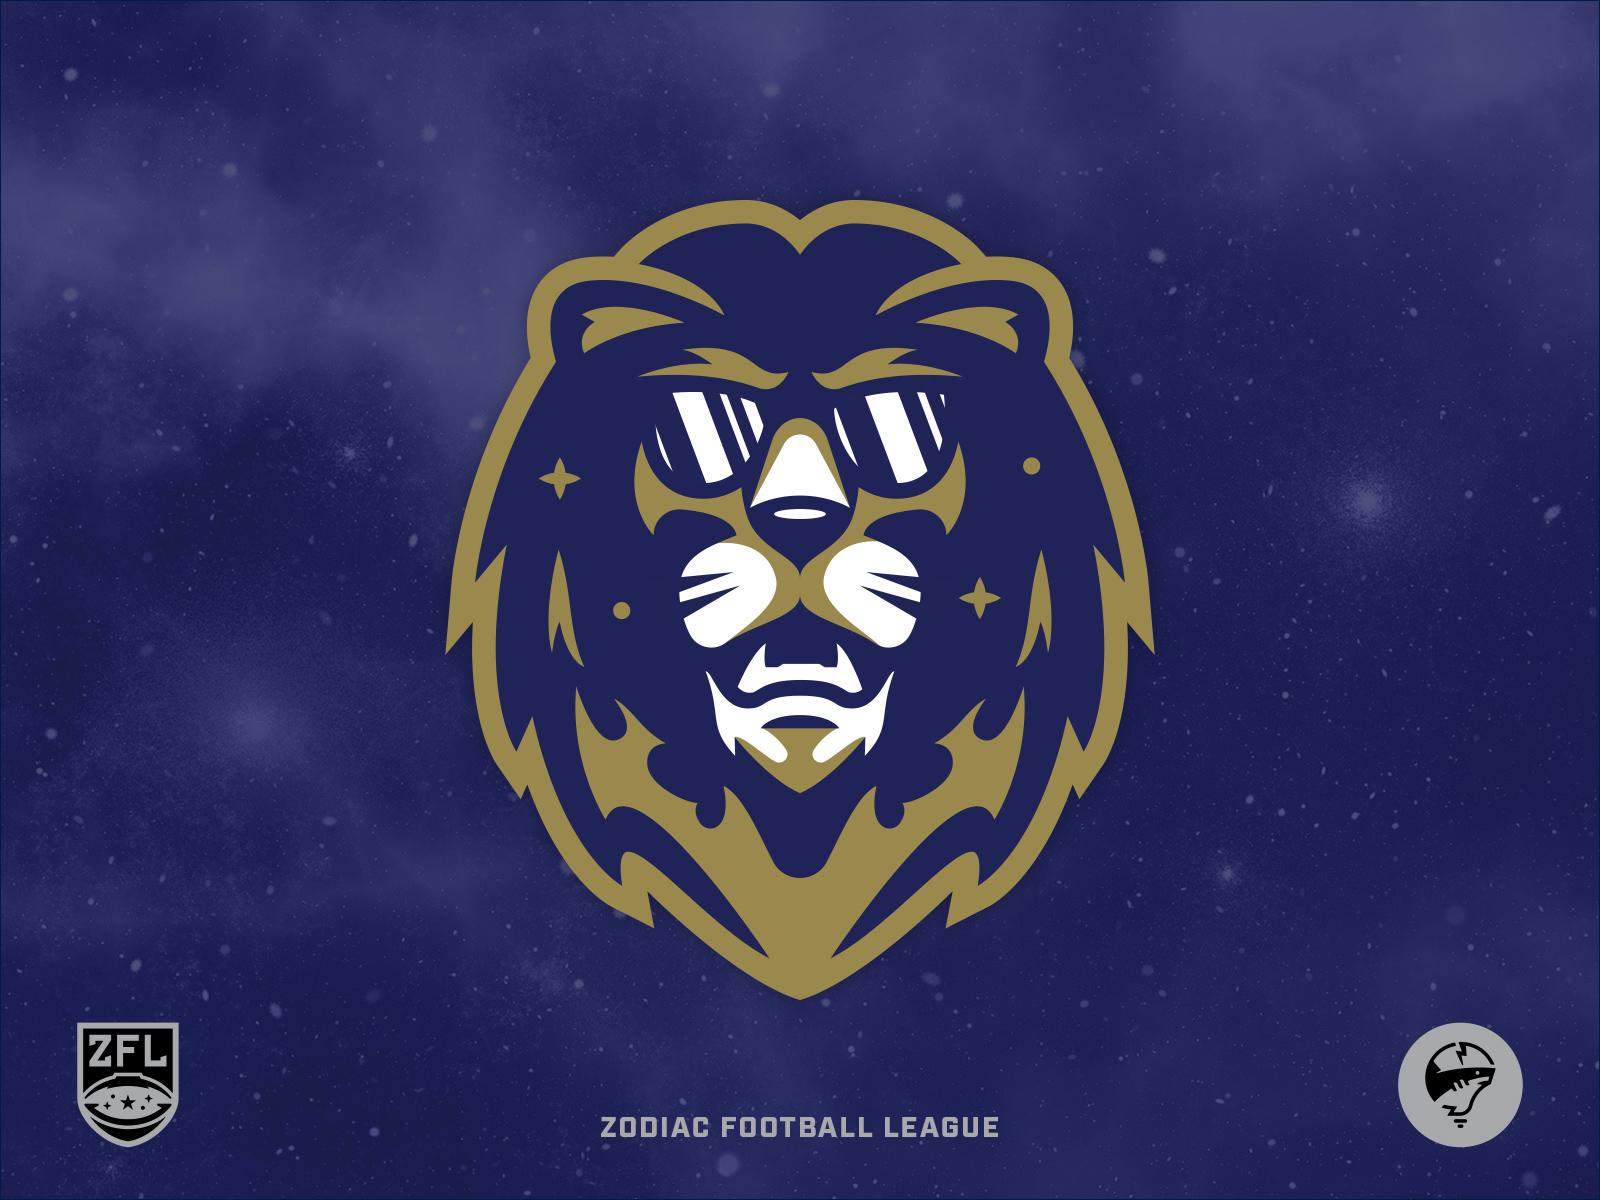 ZFL | Leo Lions Secondary Mark